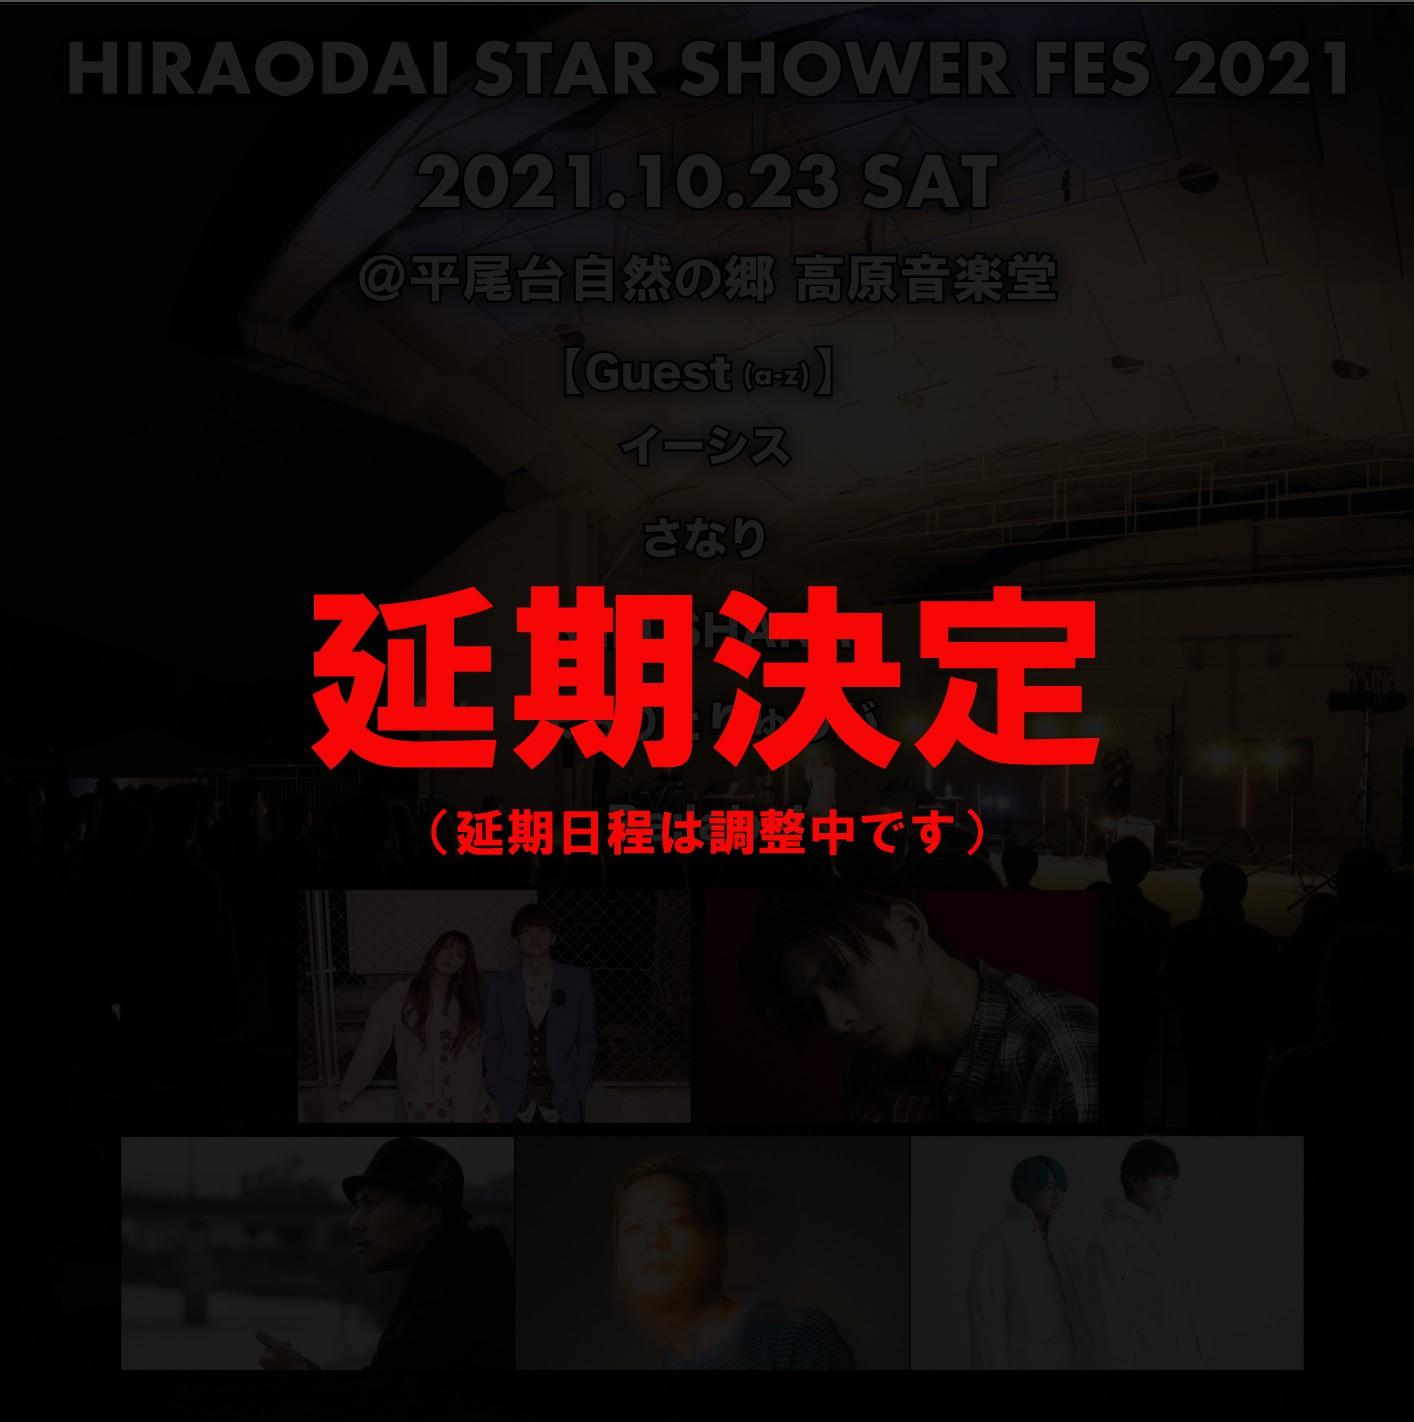 2021.10.23 HIRAODAI START SHOWER FES 2021 の開催について